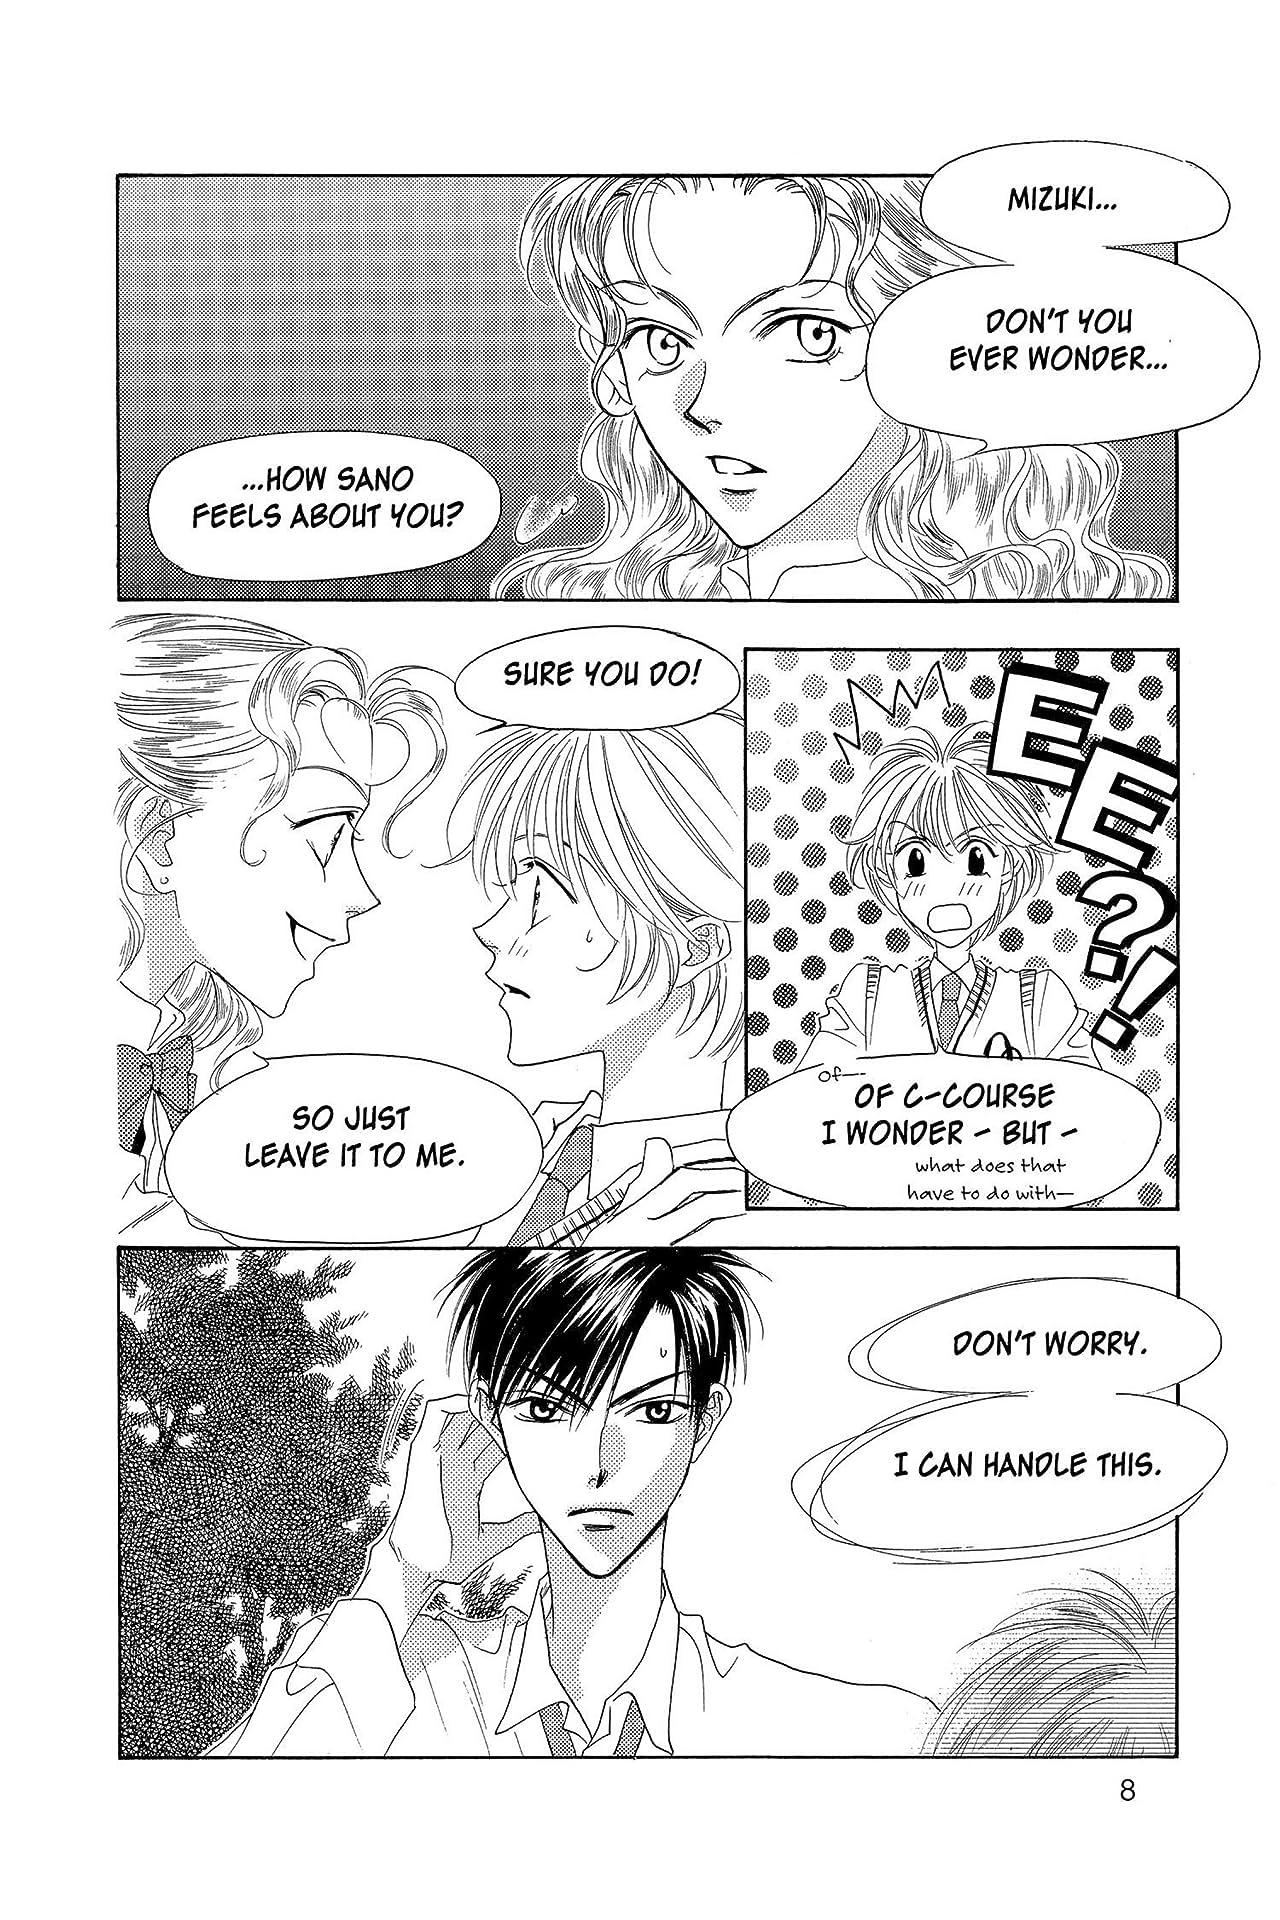 Hana-Kimi Vol. 7